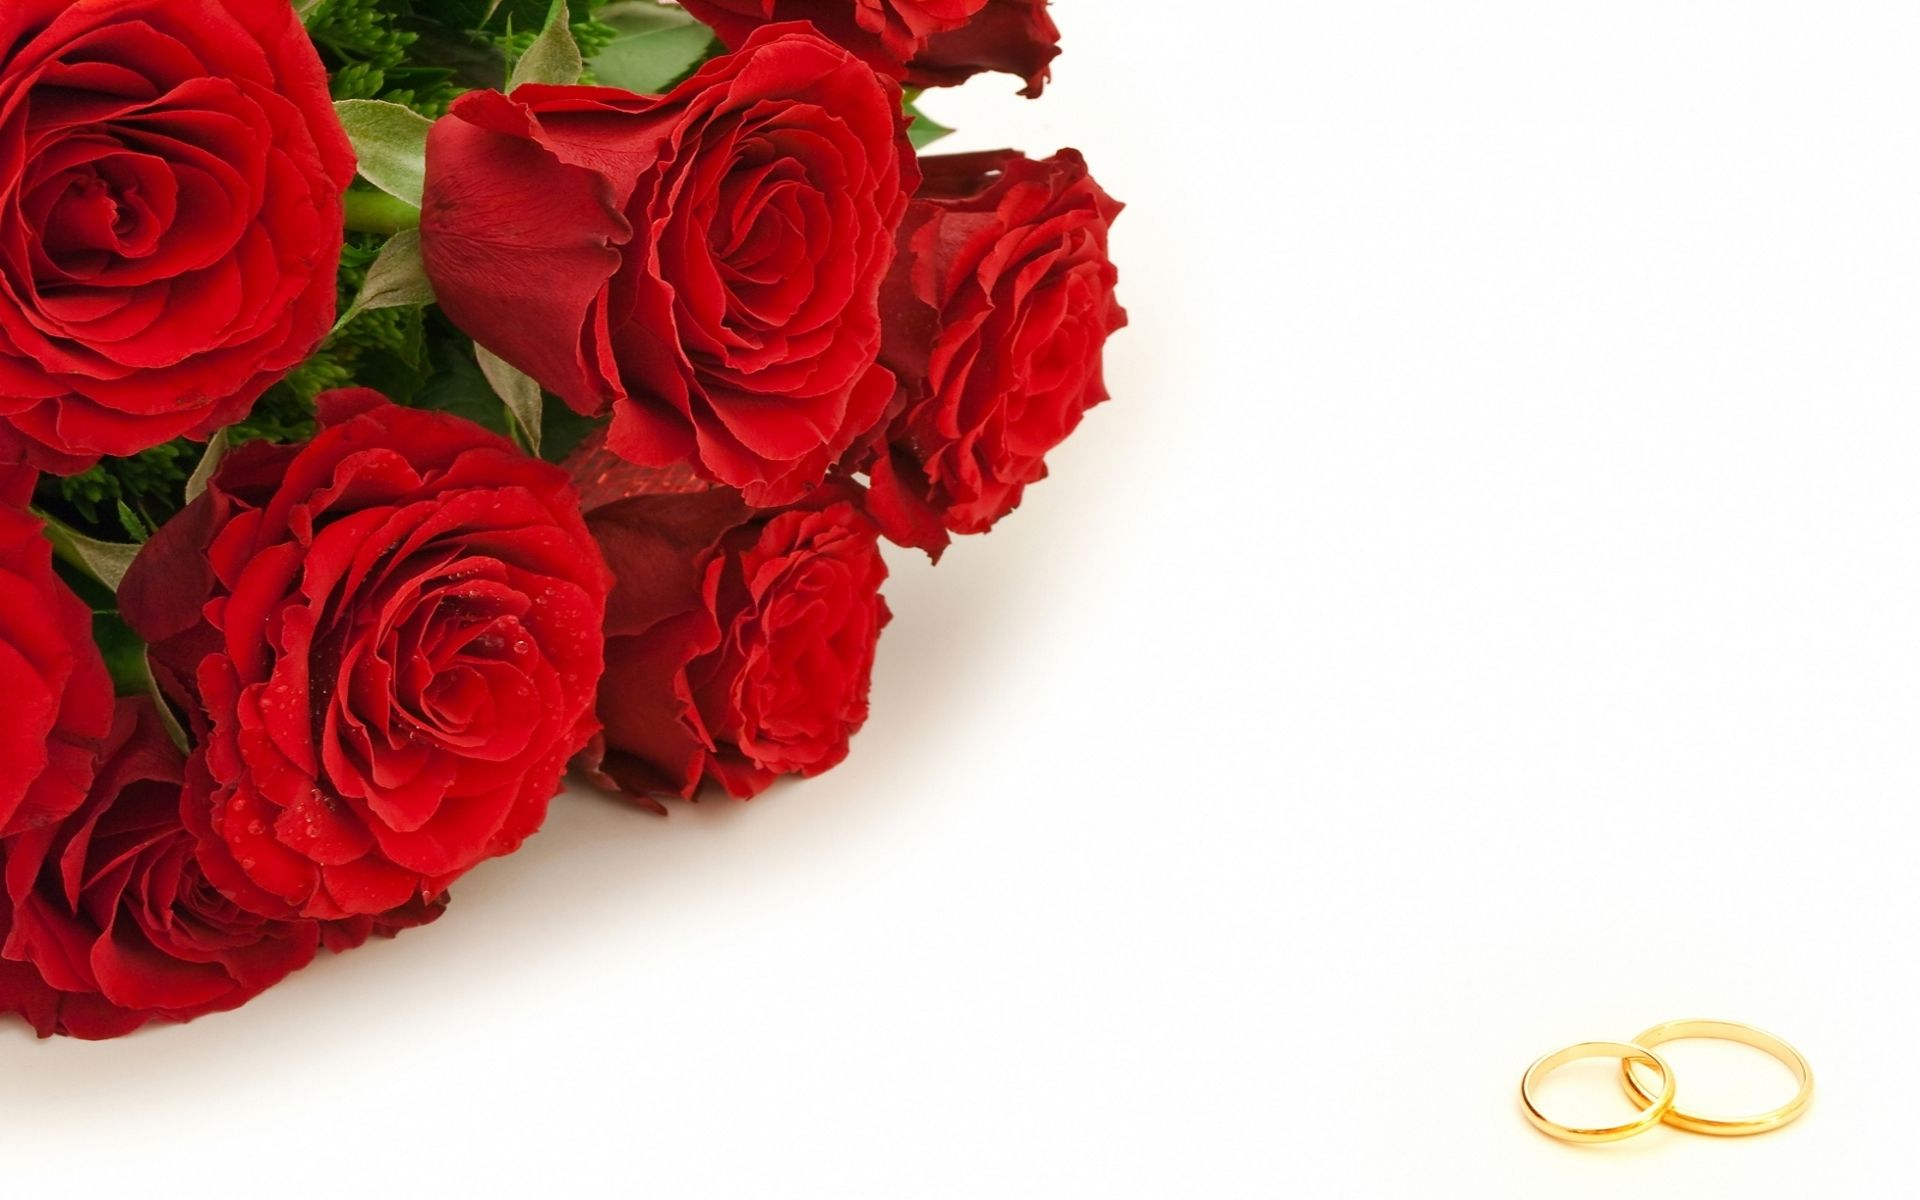 Arsen44511am Rezultaty Poiska Dlya Gnq51igk5heh2xi Rose Wallpaper Wedding Photography Business White Flower Wallpaper